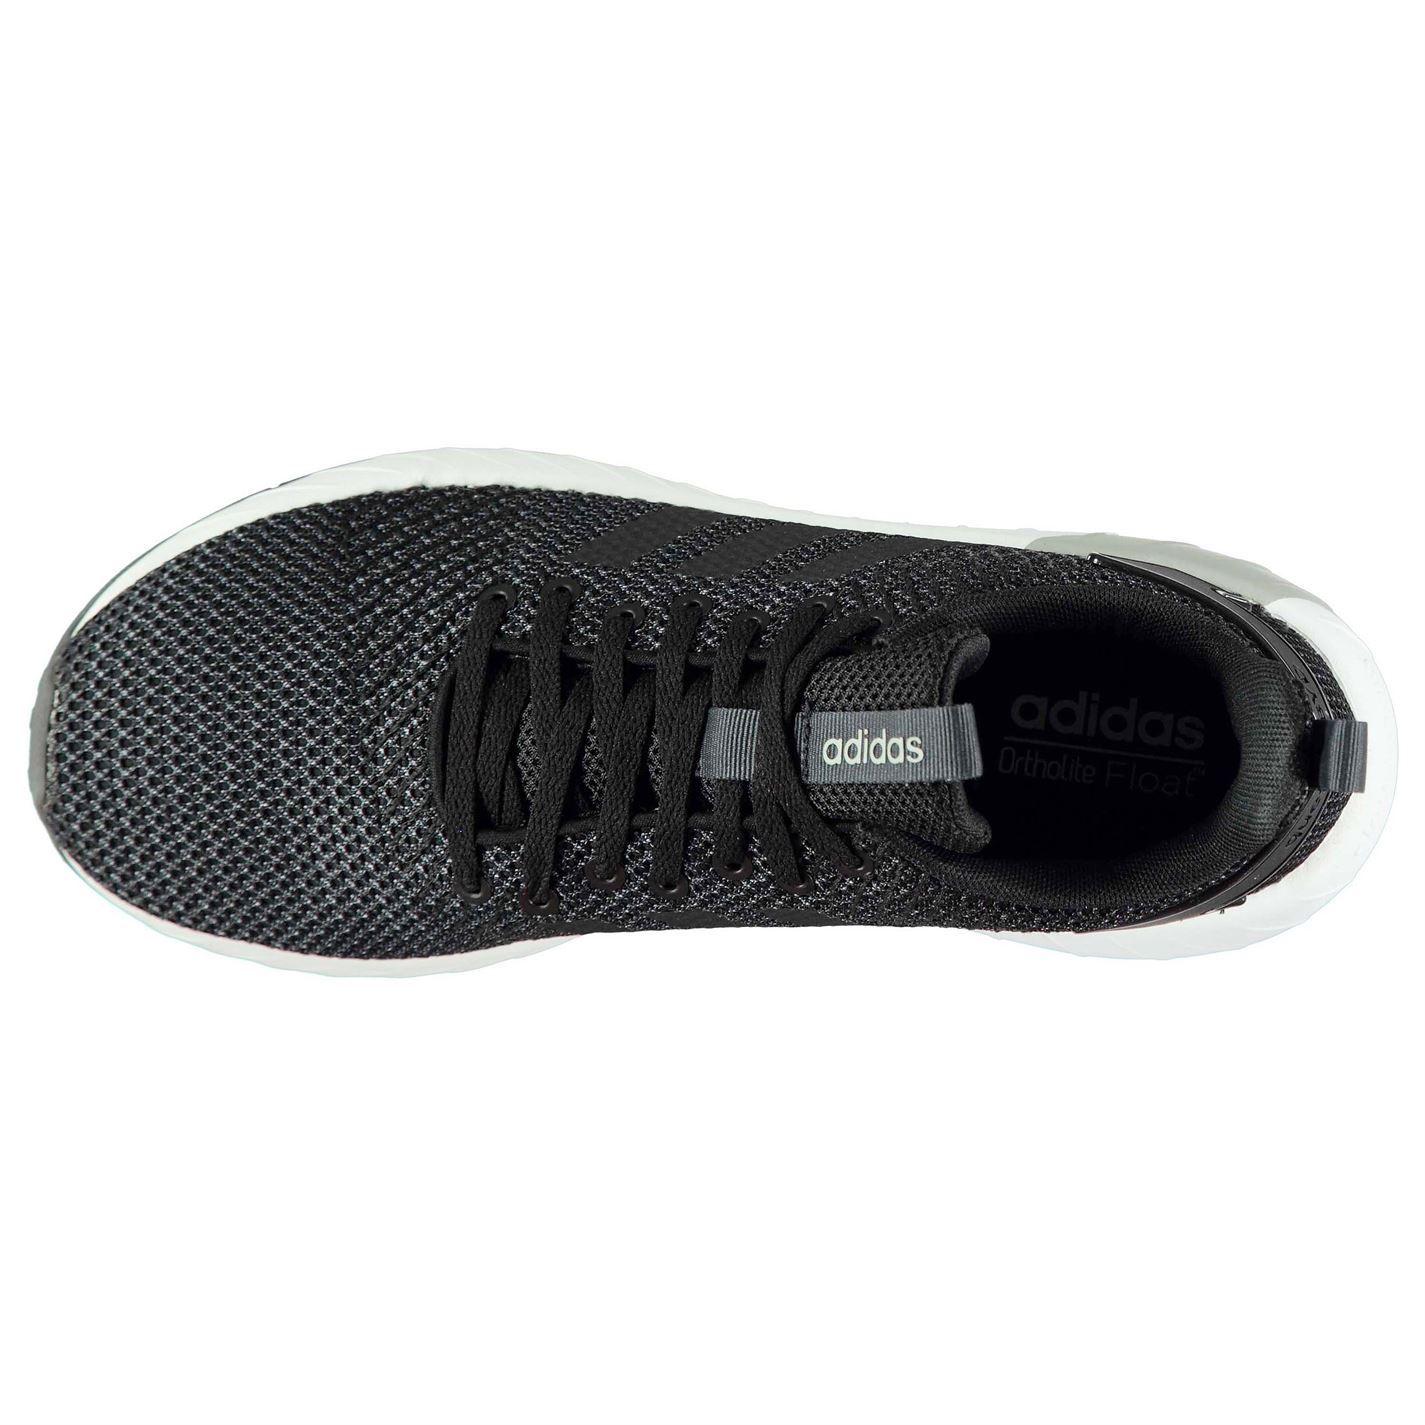 adidas questar da 82 formatori mens nero / bianco / carbonio atletica